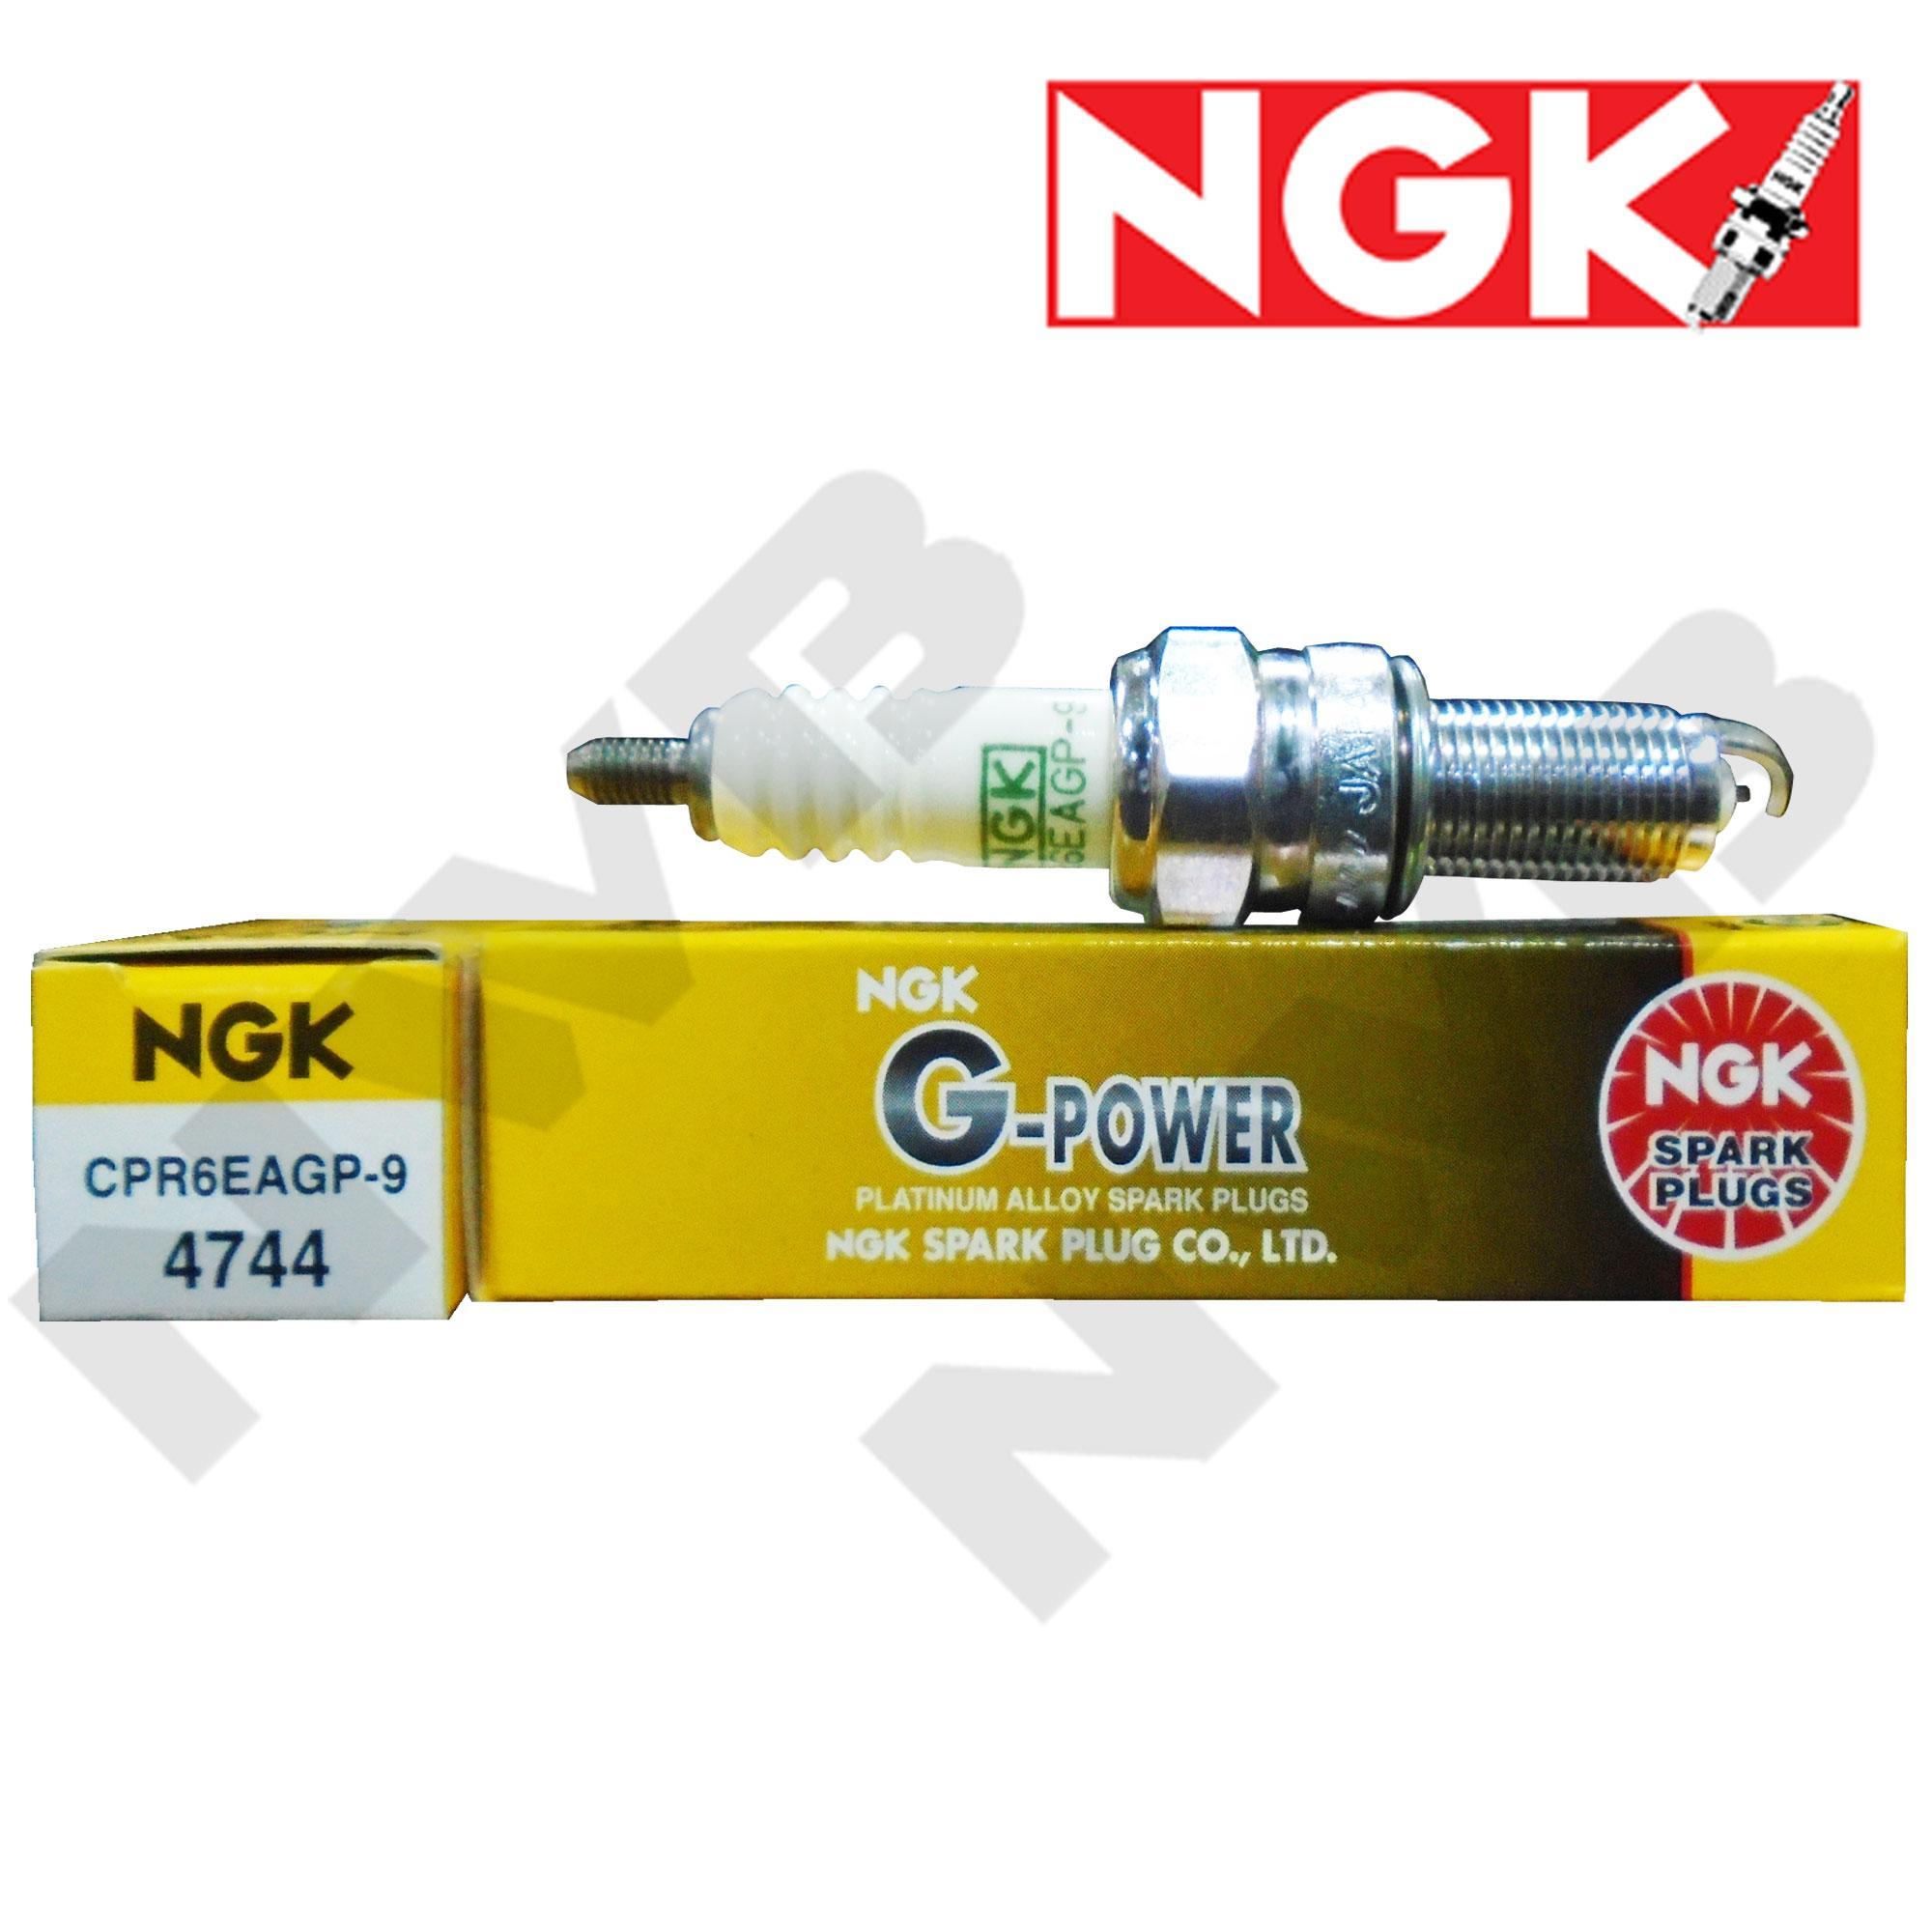 Ngk Cpr6eagp-9 Spark Plug By Nwb Wiper Blade.